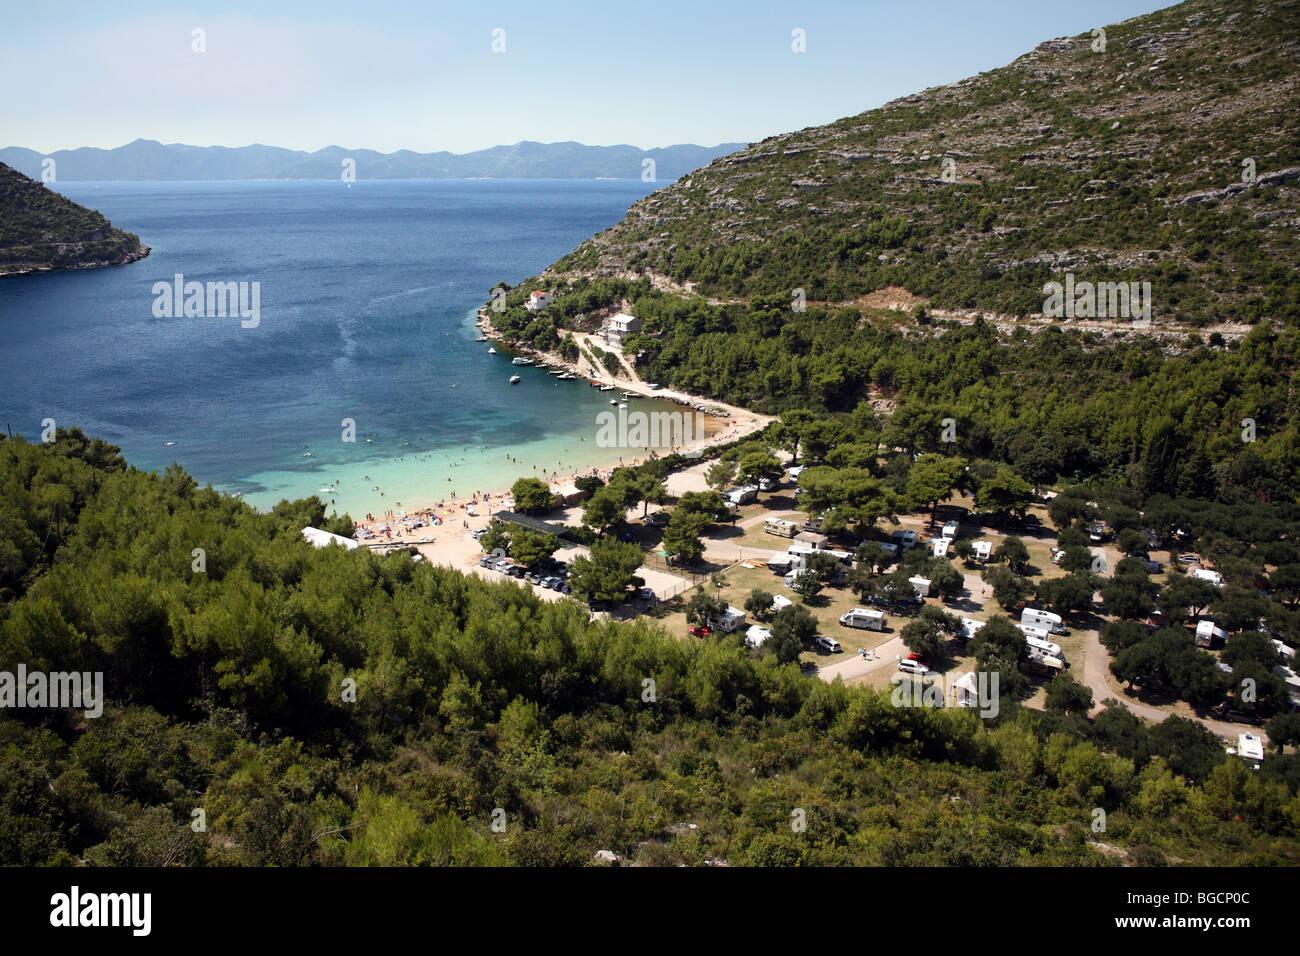 Croatia Adriatic coast. Tourist camp in Prapratno bay. - Stock Image